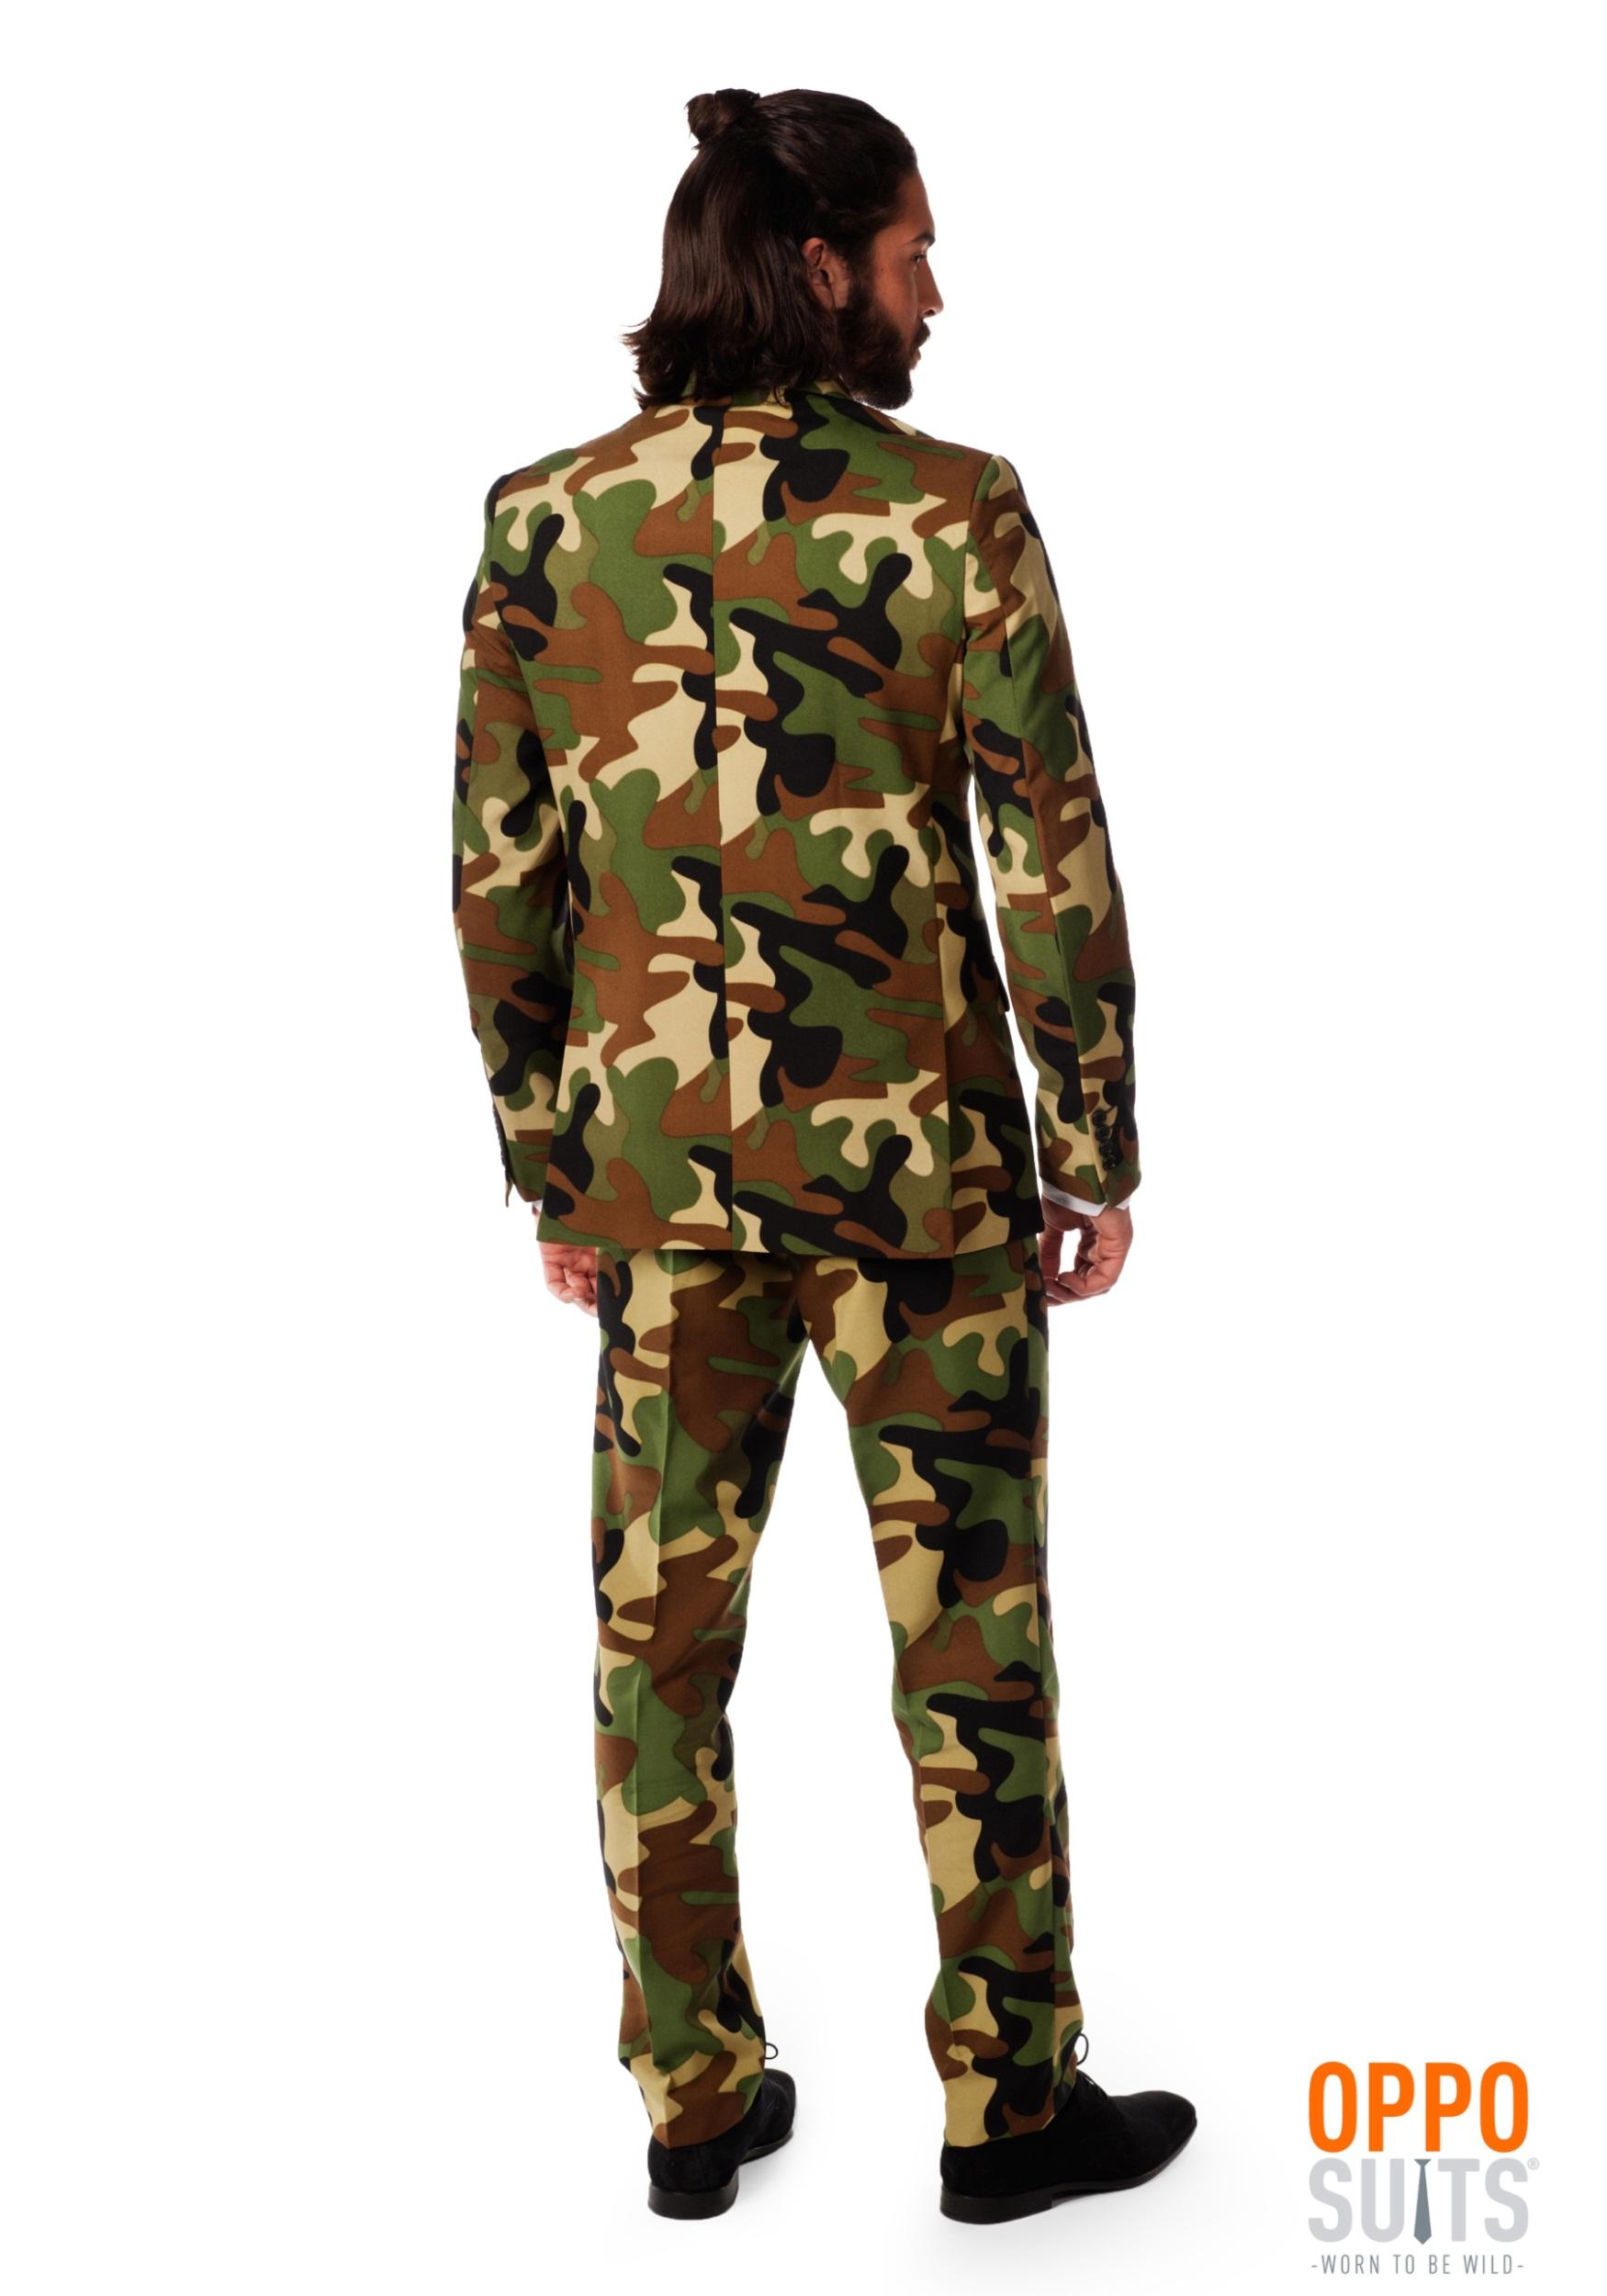 Mens OppoSuits Camo Suit